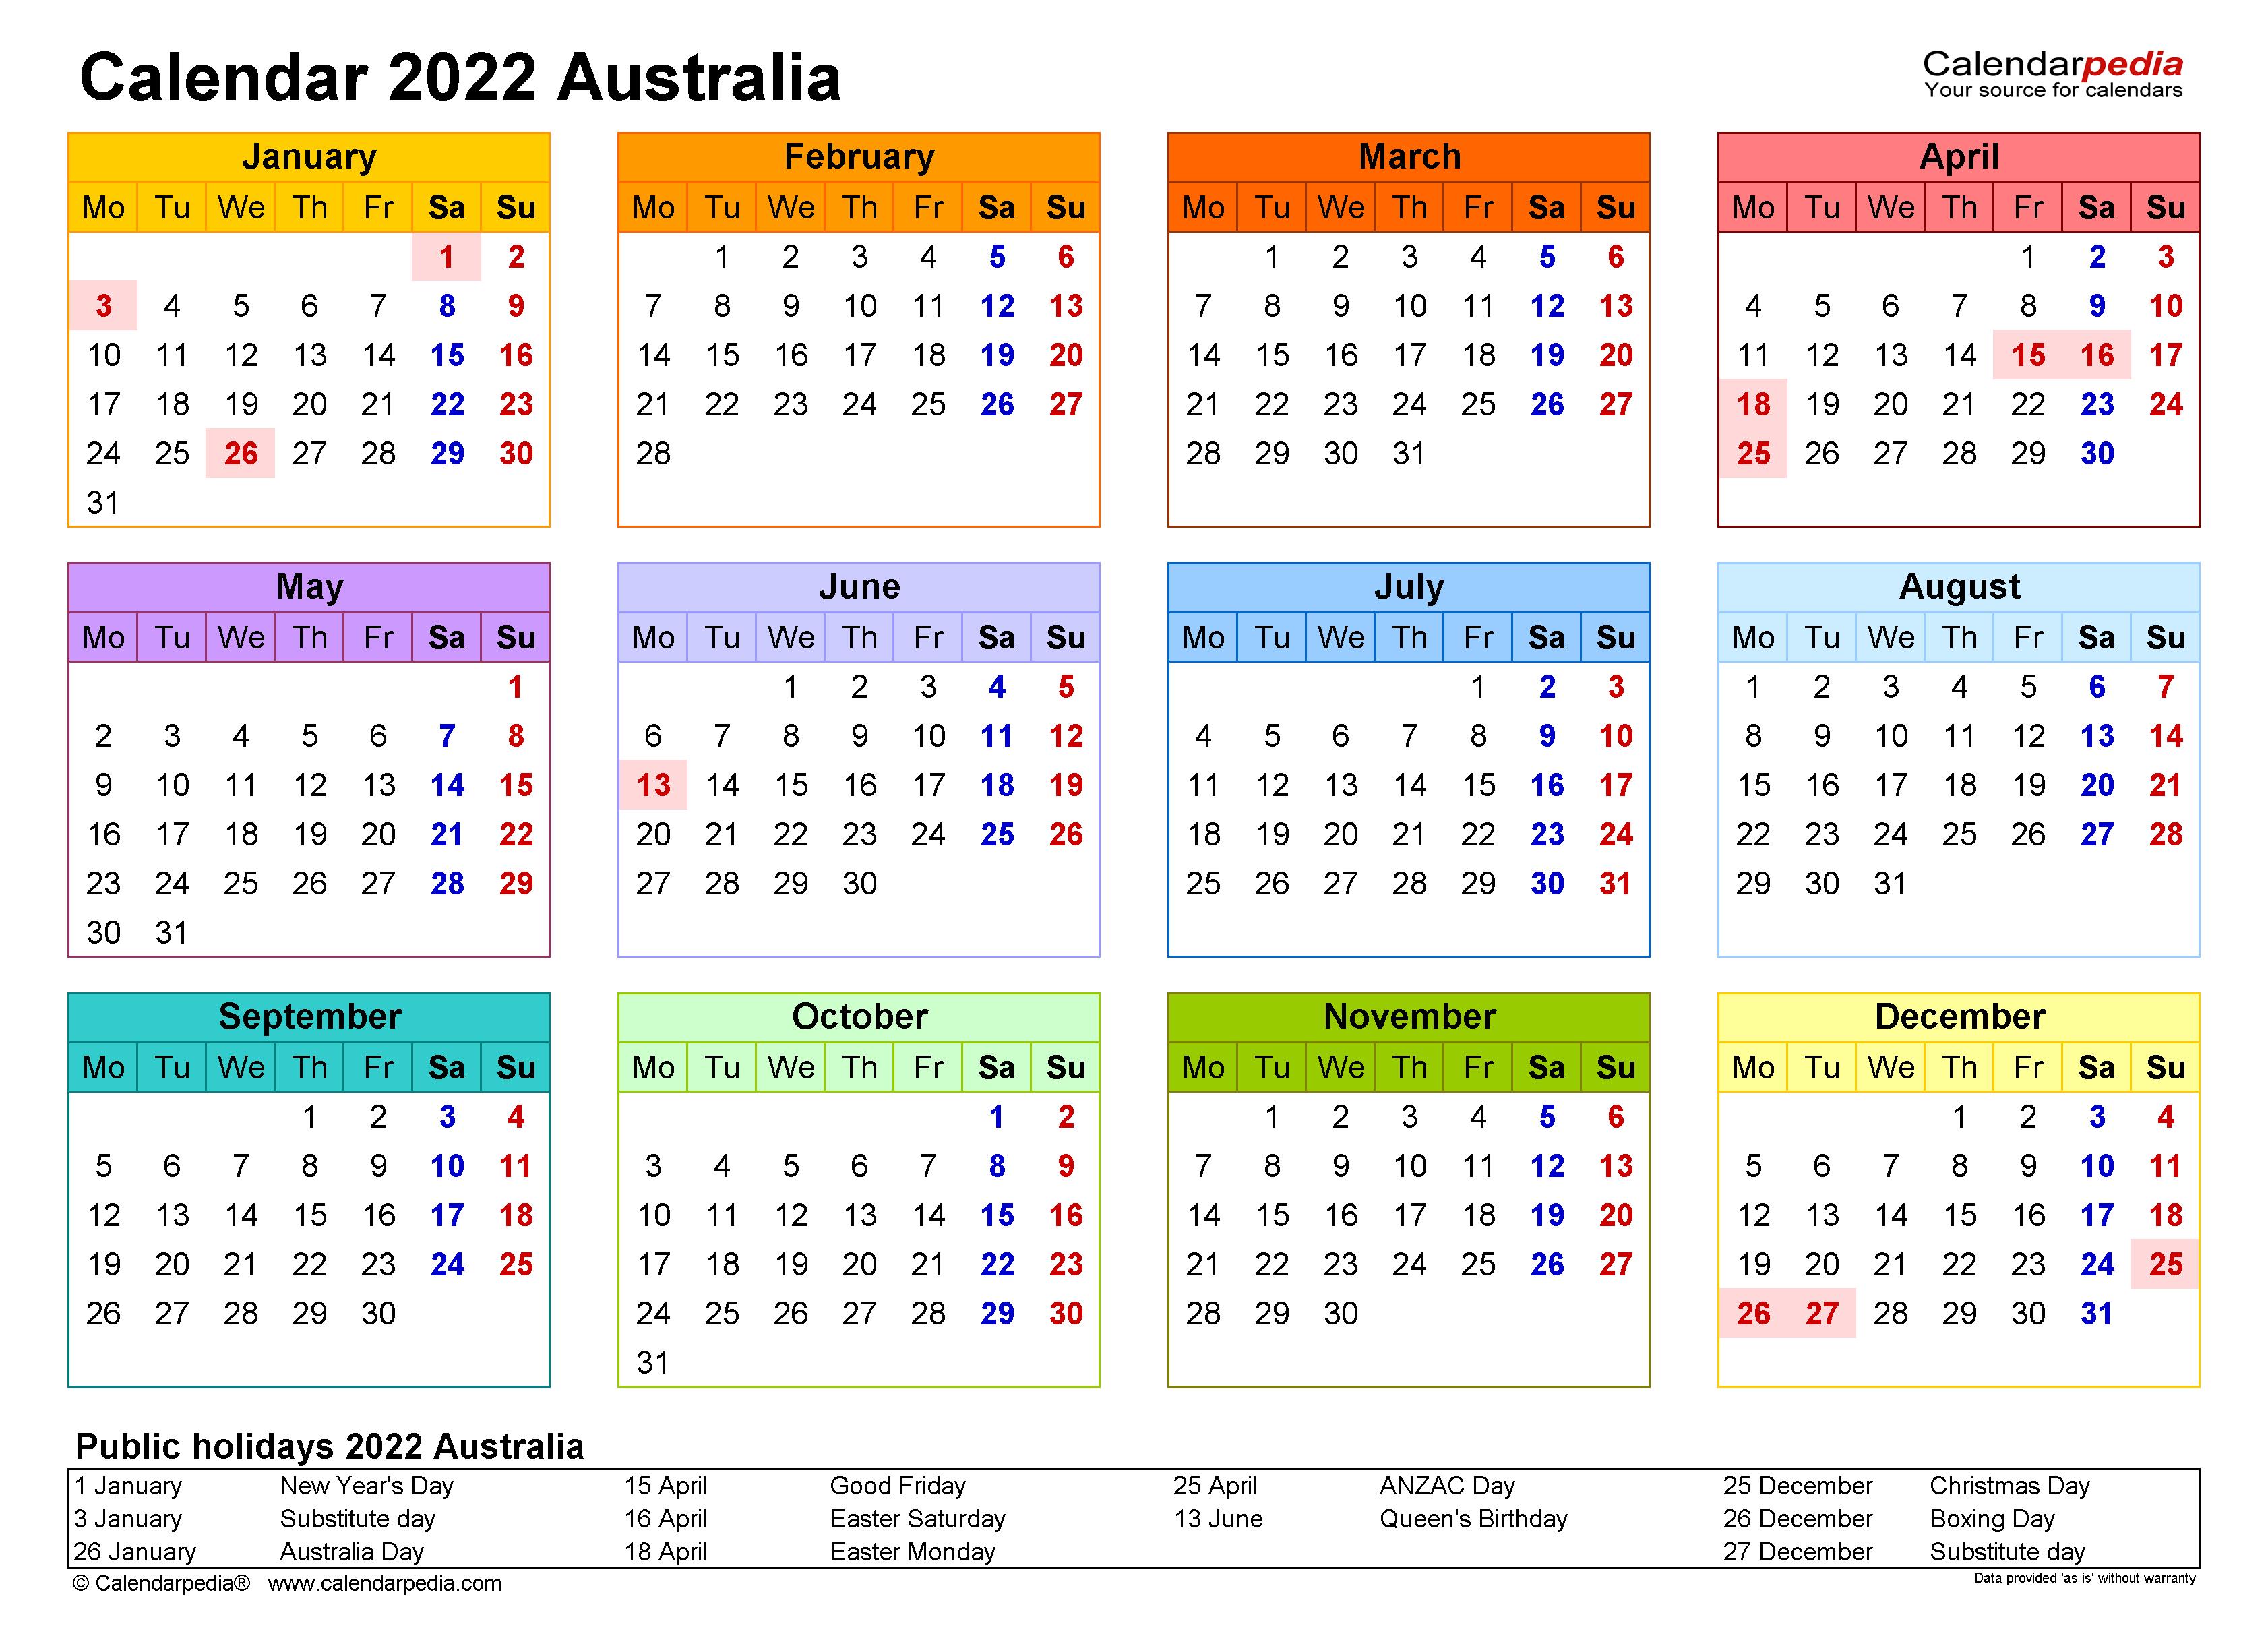 Calendar 2022 Template.Australia Calendar 2022 Free Printable Excel Templates